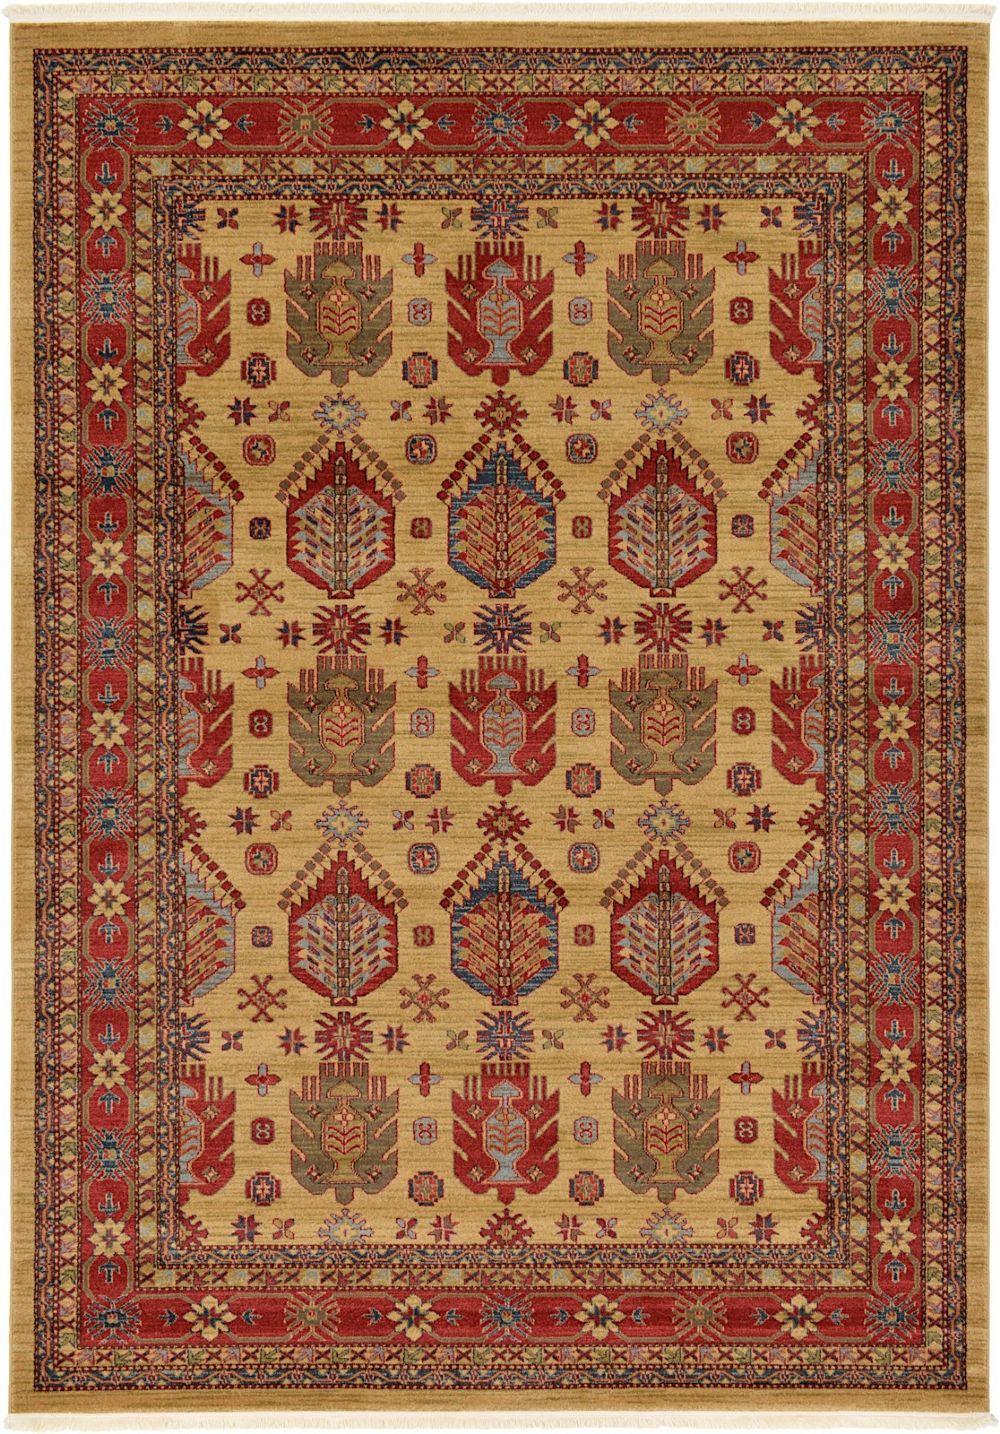 rugpal azar southwestern/lodge area rug collection